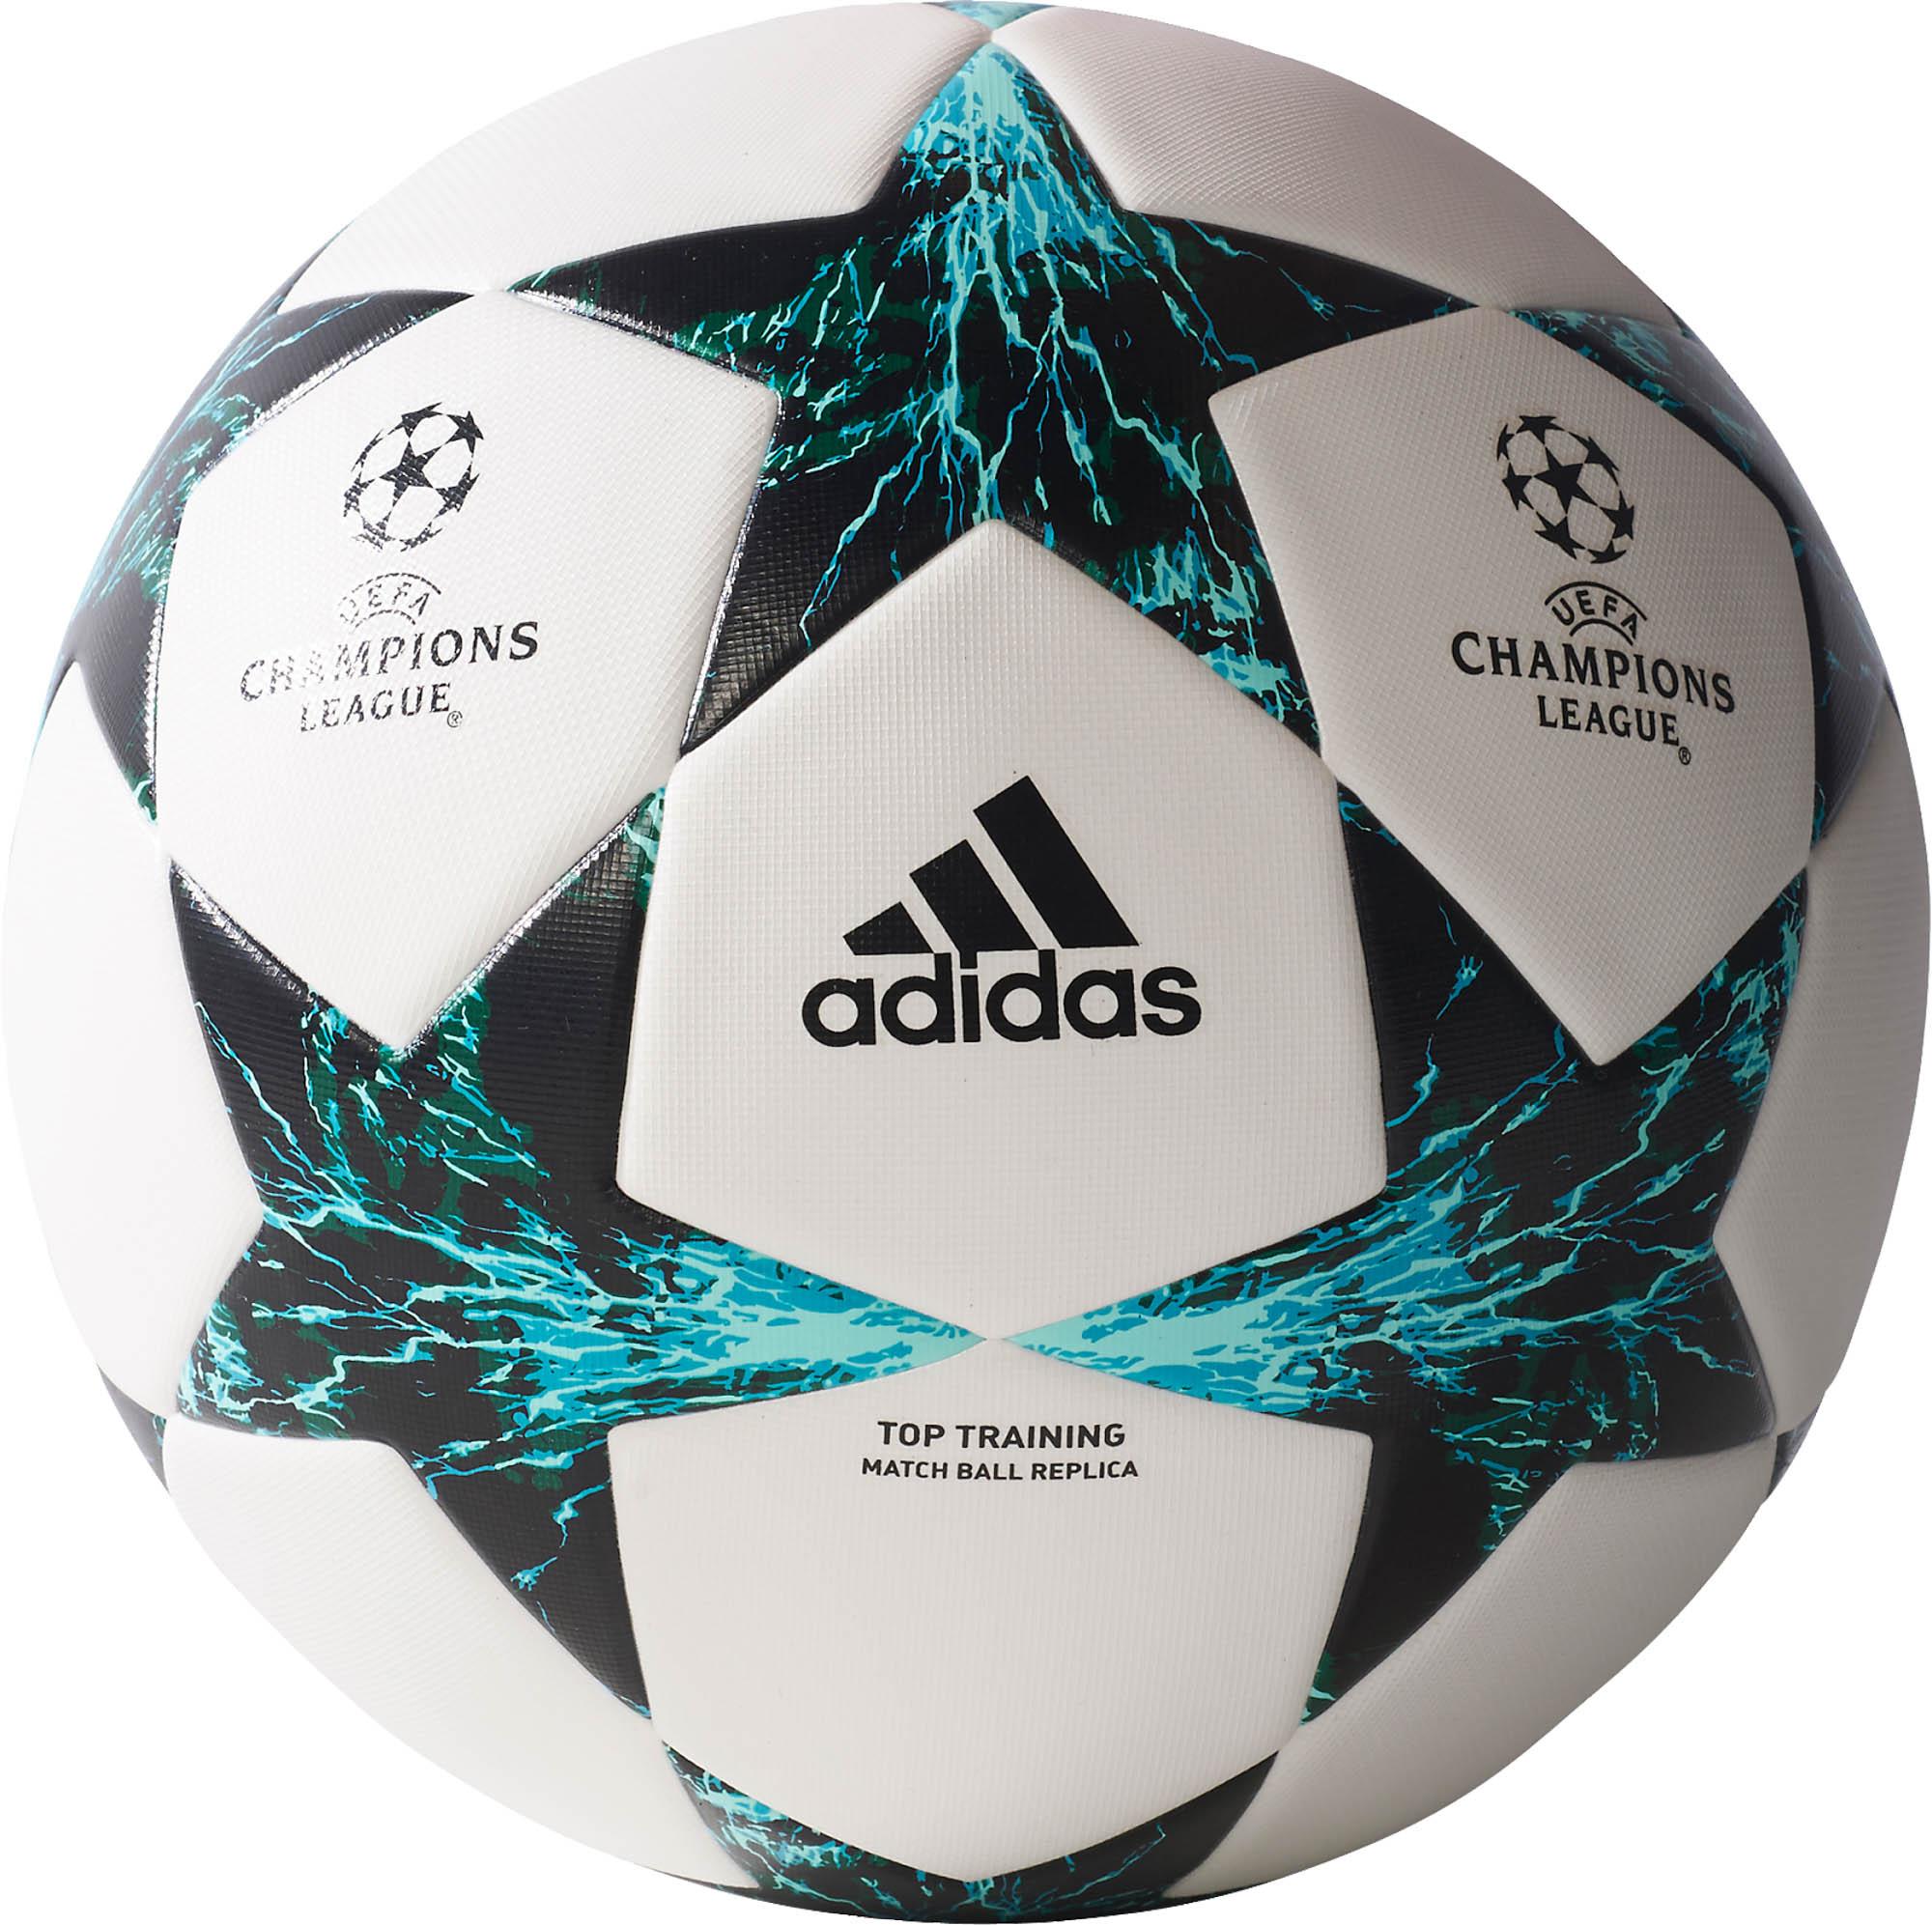 5753246caf7 adidas Finale 17 Top Training Ball - adidas Soccer Balls